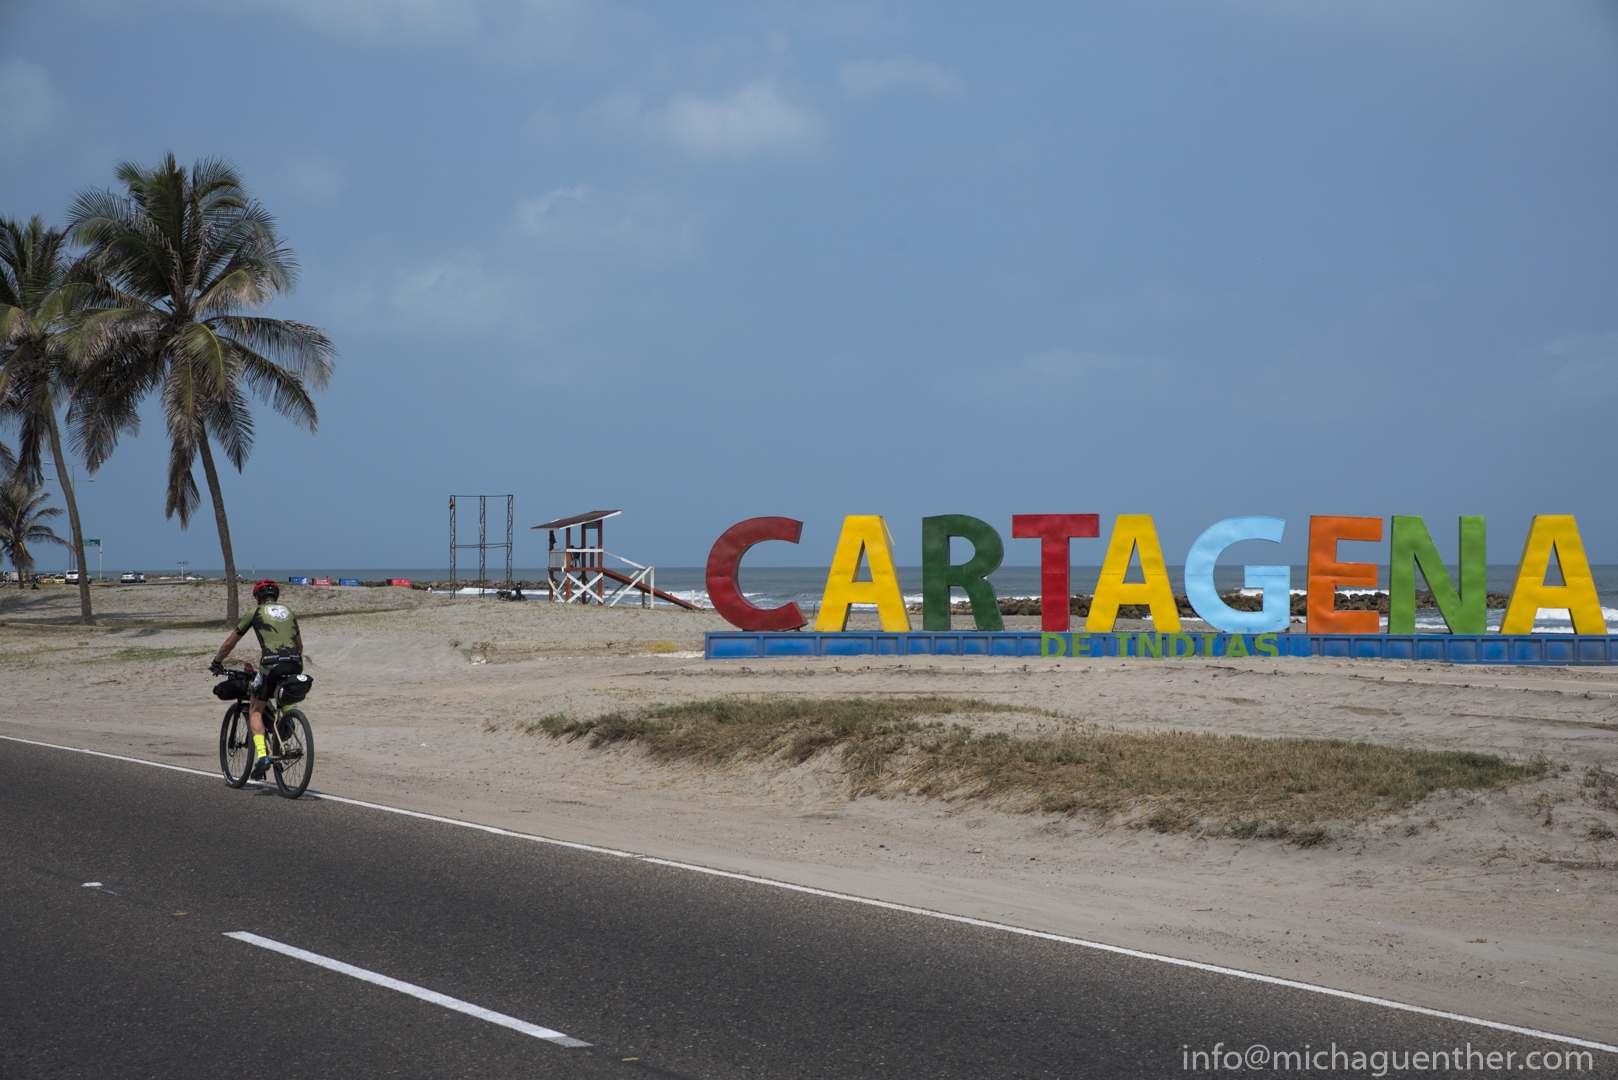 Ankunft in Cartagena